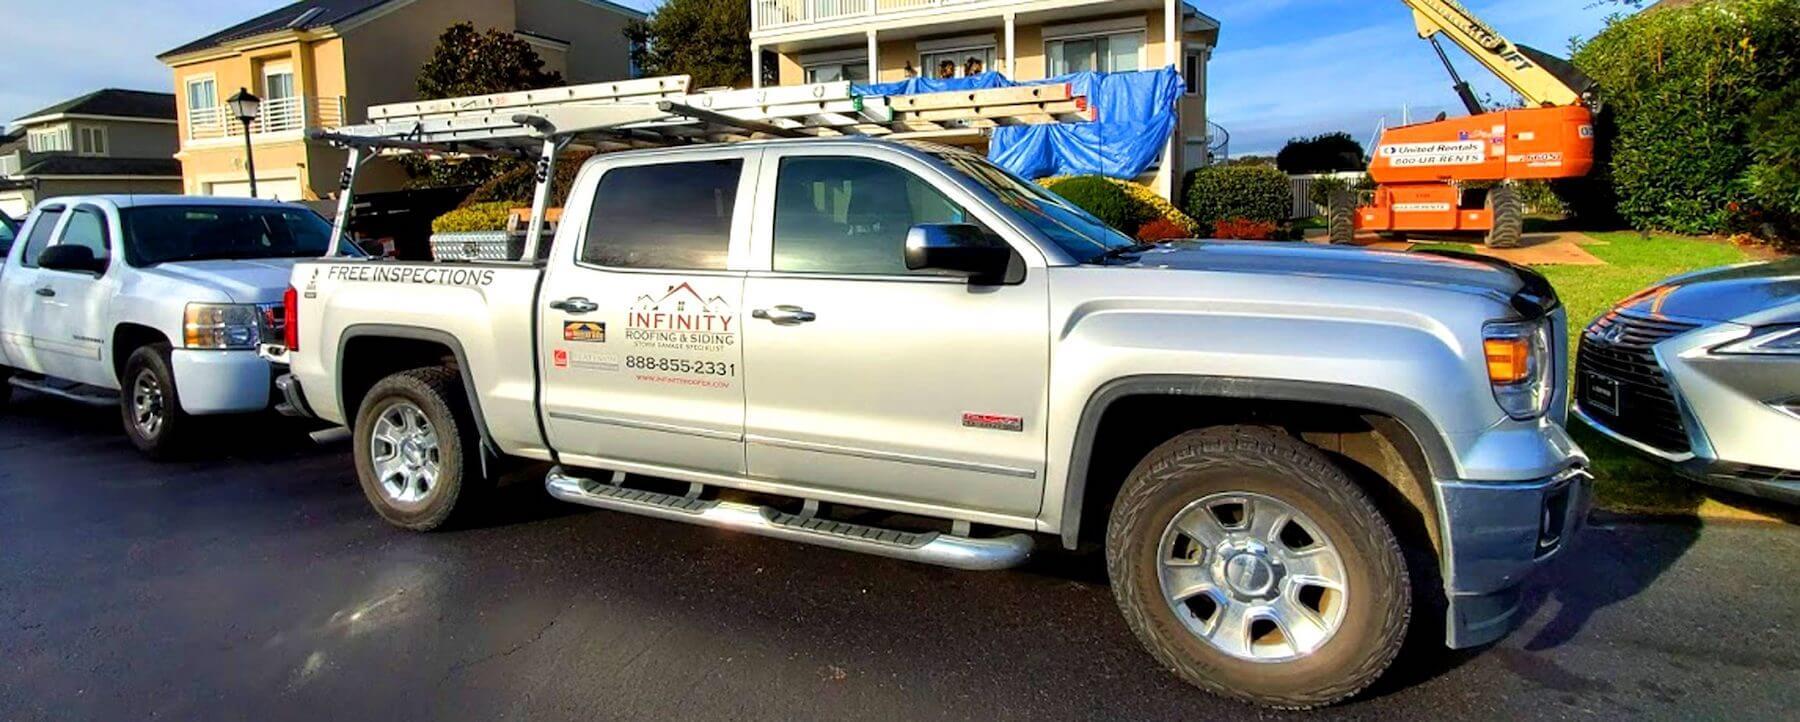 roof repair company truck